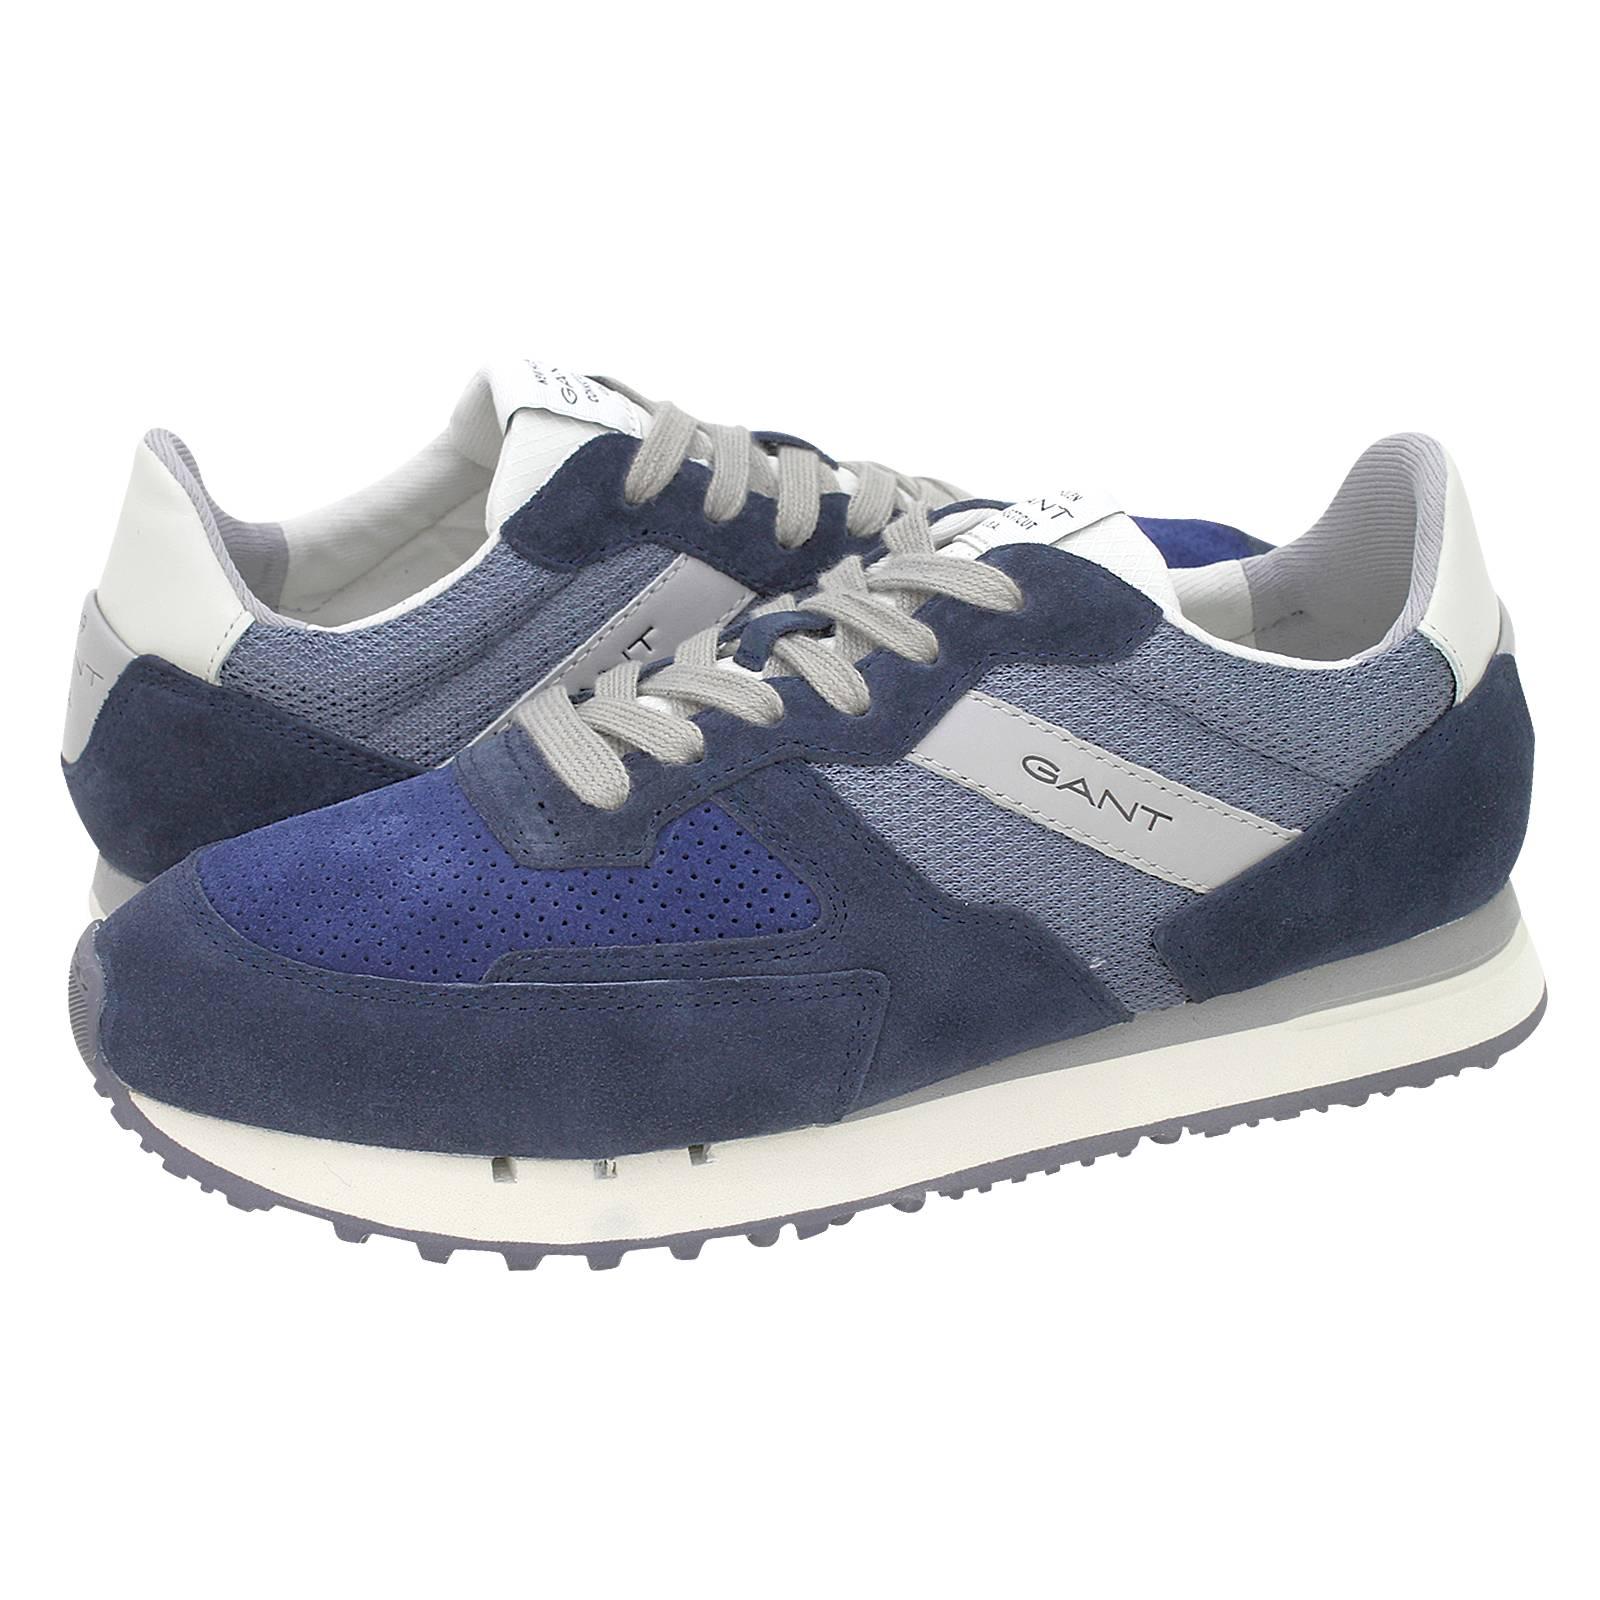 Duke - Gant Men's casual shoes made of